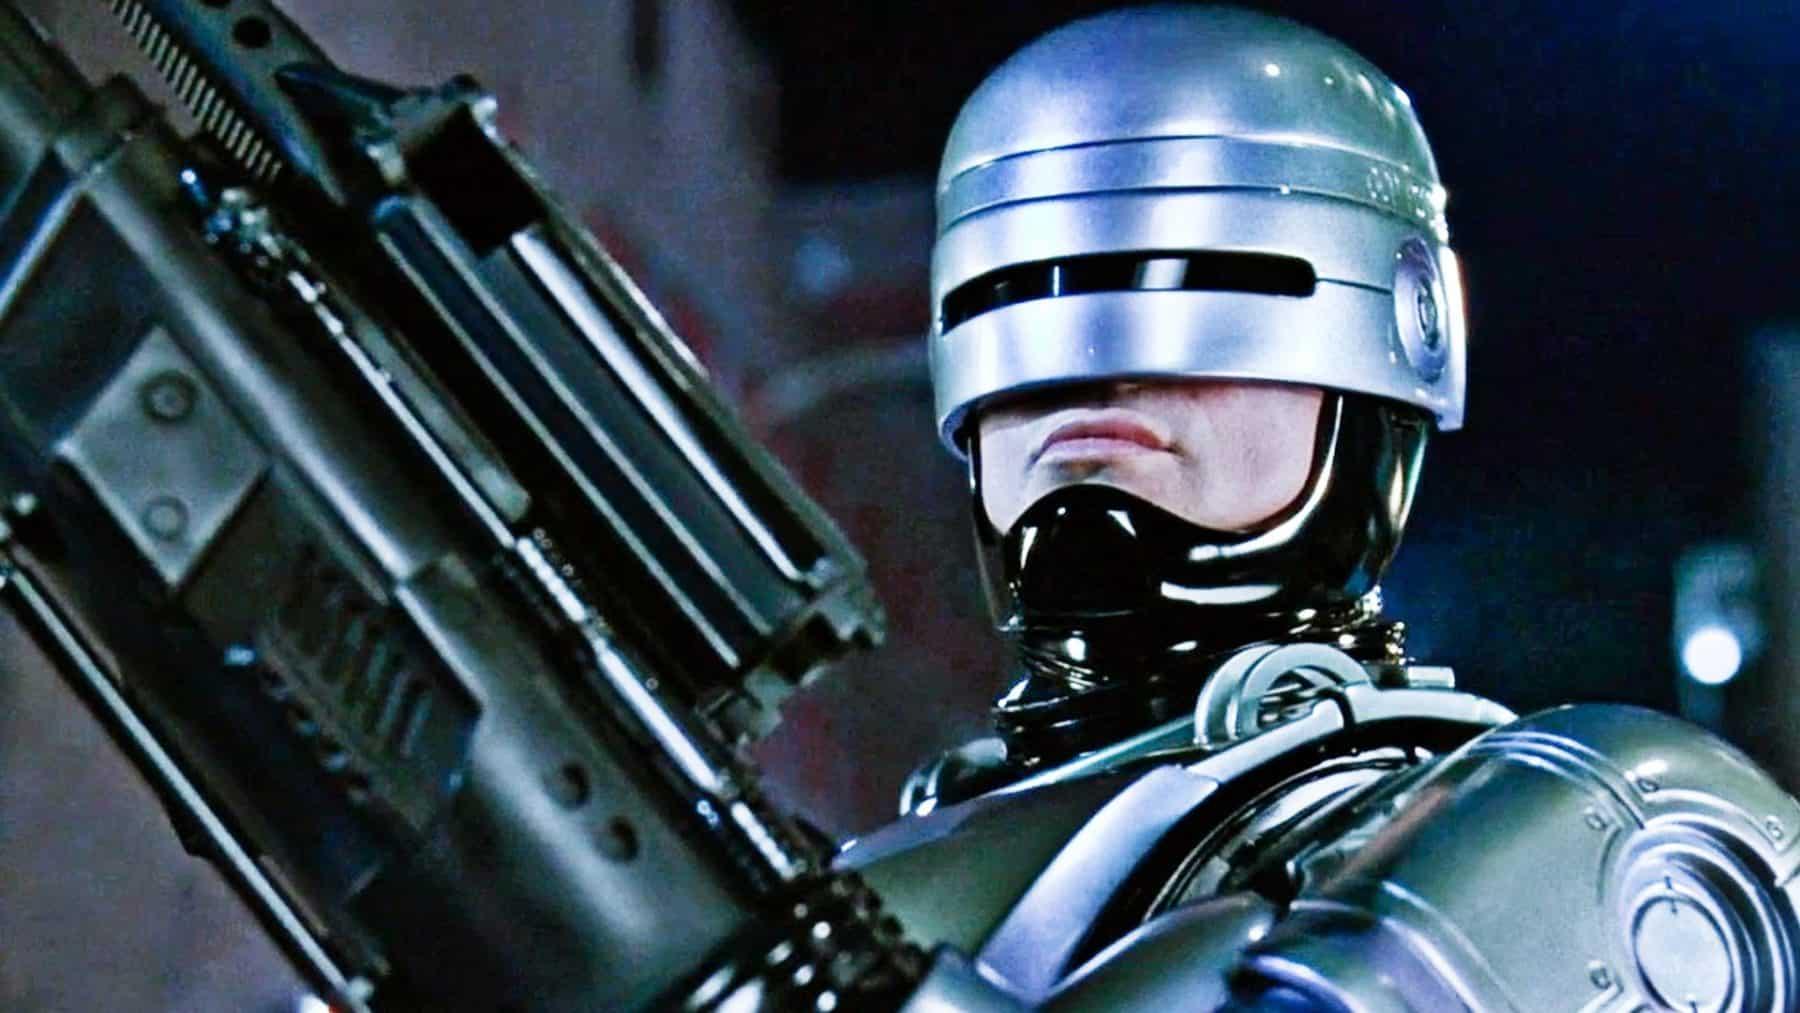 La secuela RoboCop Returns de Neill Blomkamp será Rated-R para MGM